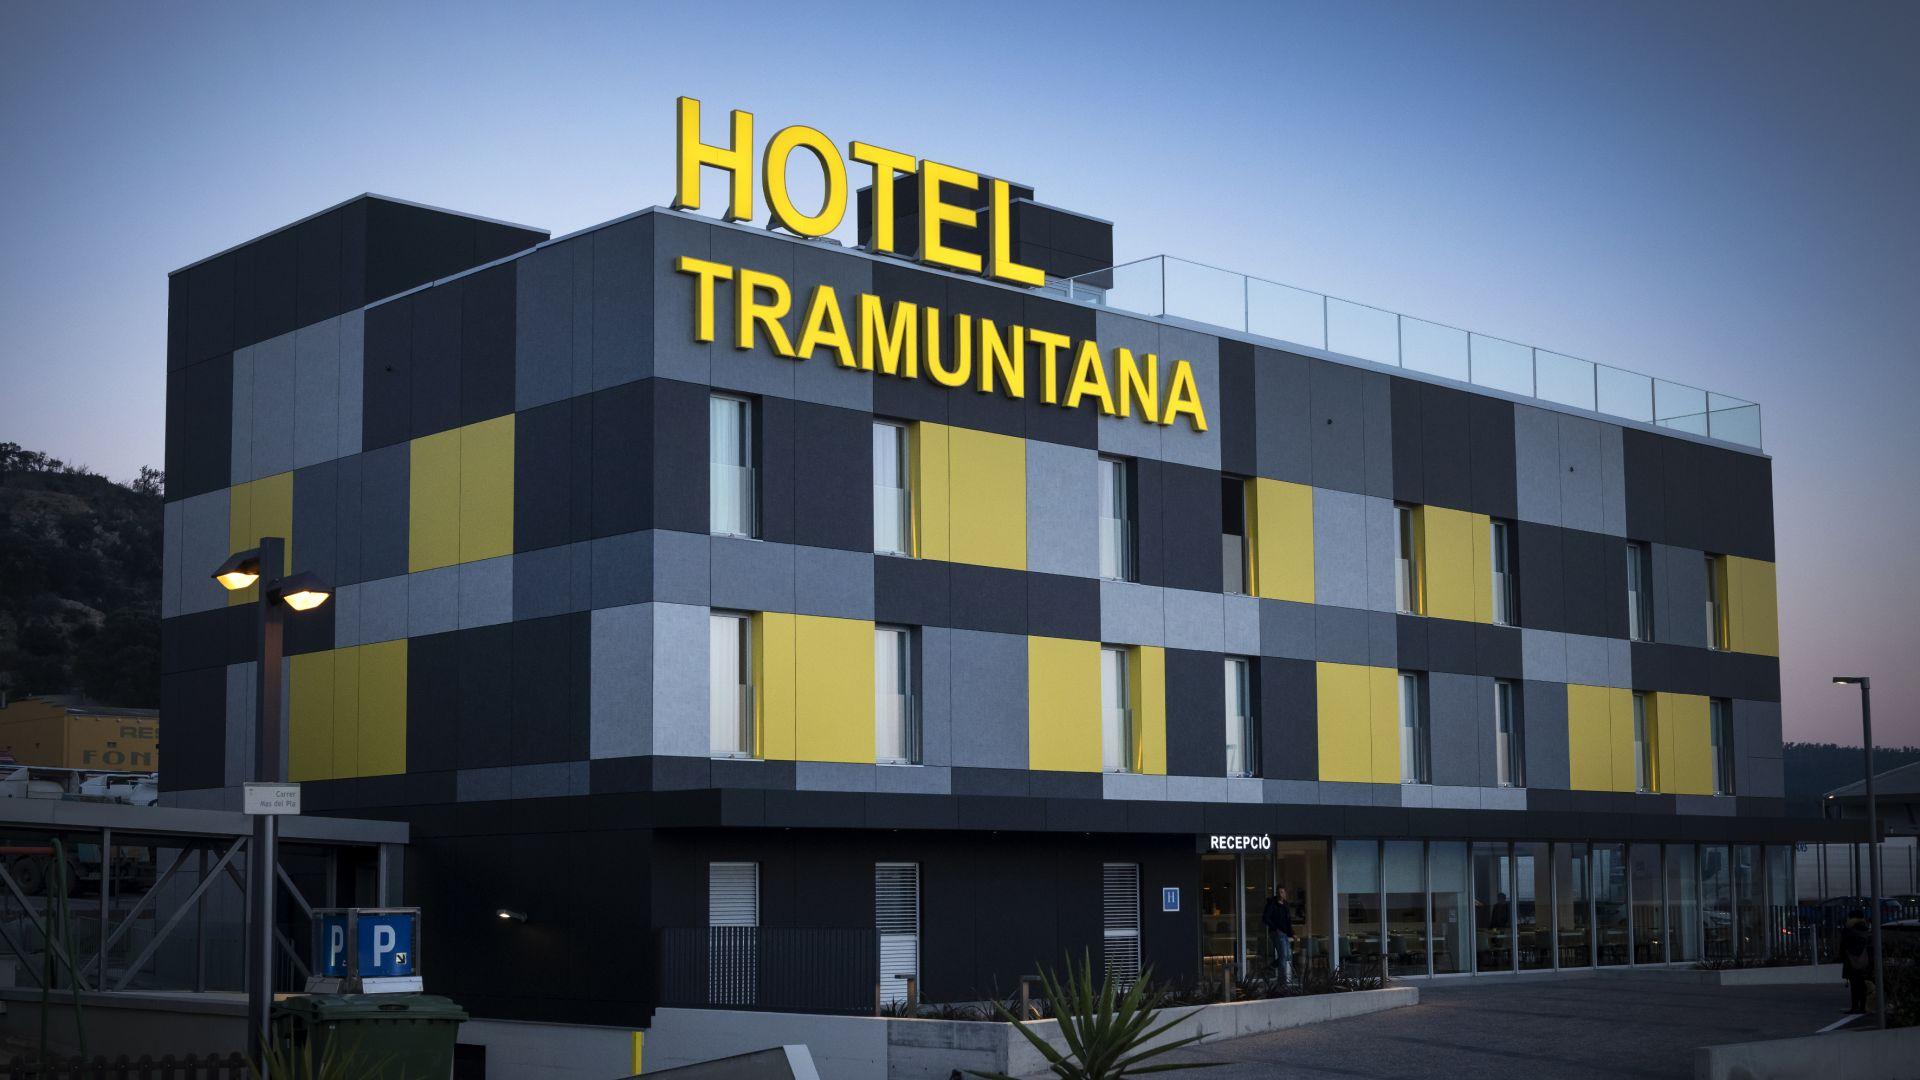 Welcome to Hotel Tramuntana